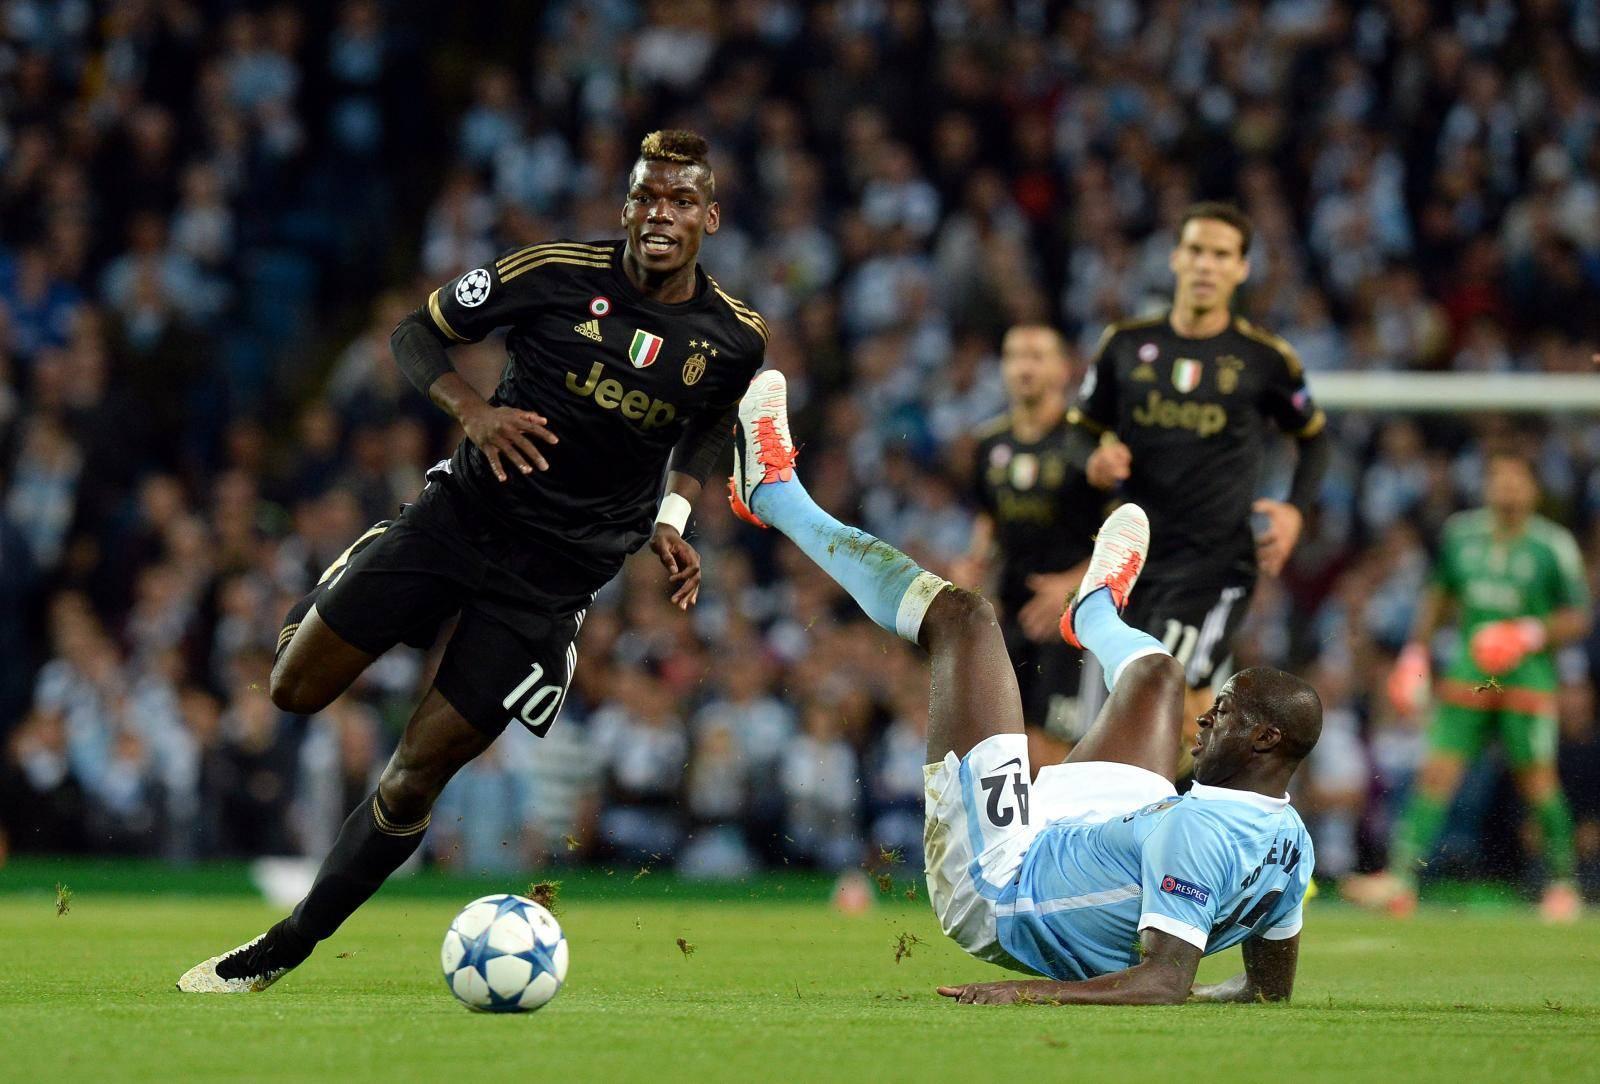 Soccer - UEFA Champions League - Group D - Manchester City v Juventus - Etihad Stadium